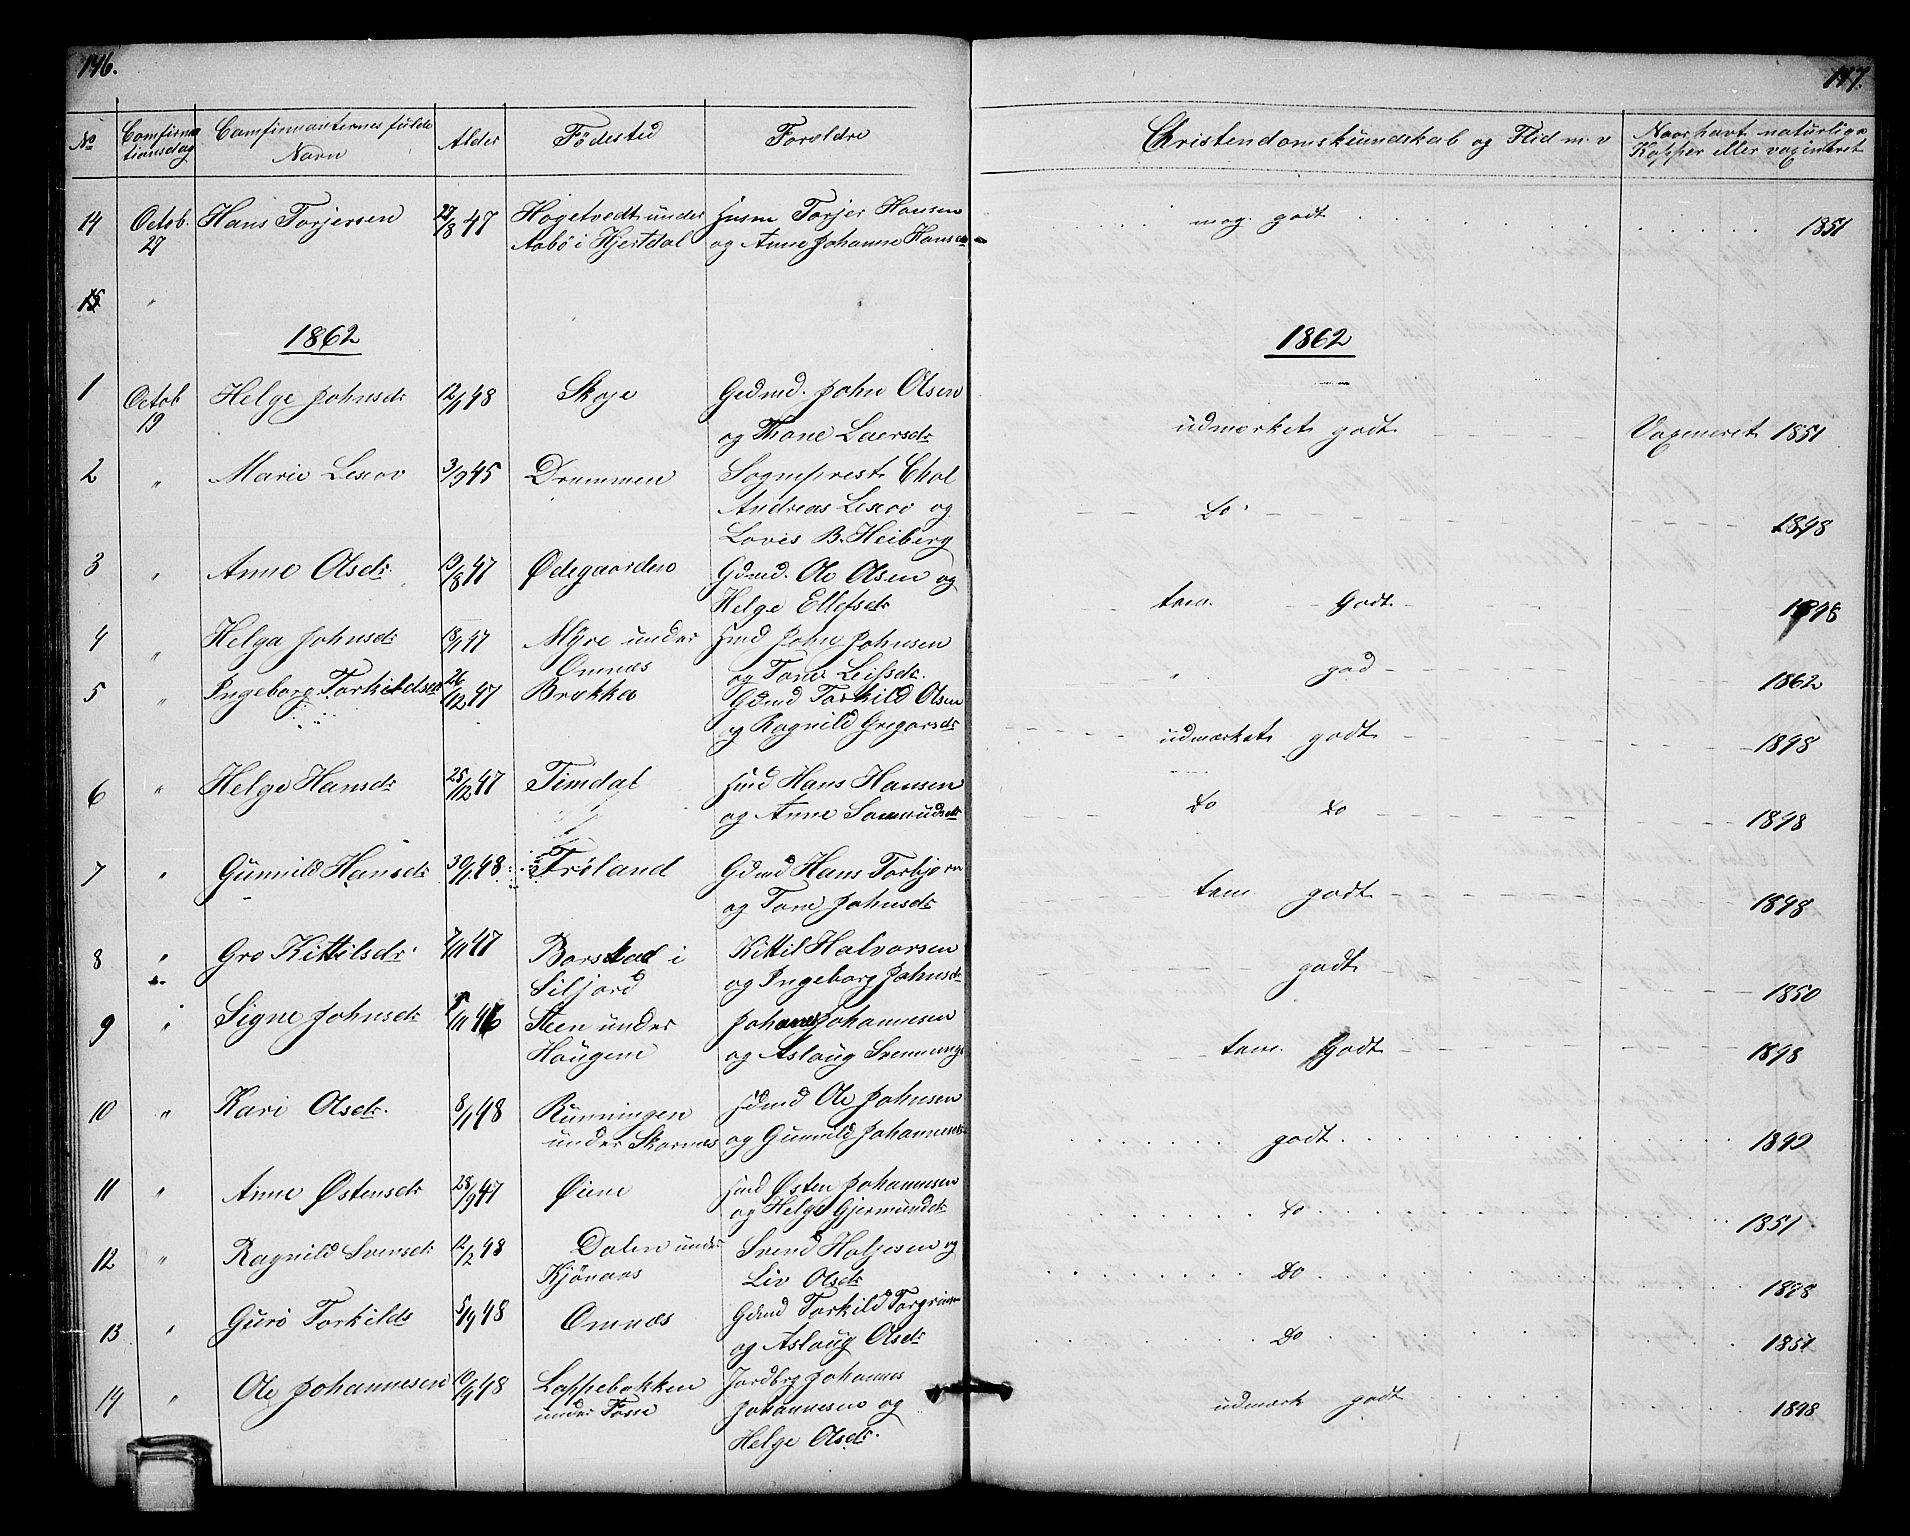 SAKO, Hjartdal kirkebøker, G/Gb/L0002: Klokkerbok nr. II 2, 1854-1884, s. 146-147